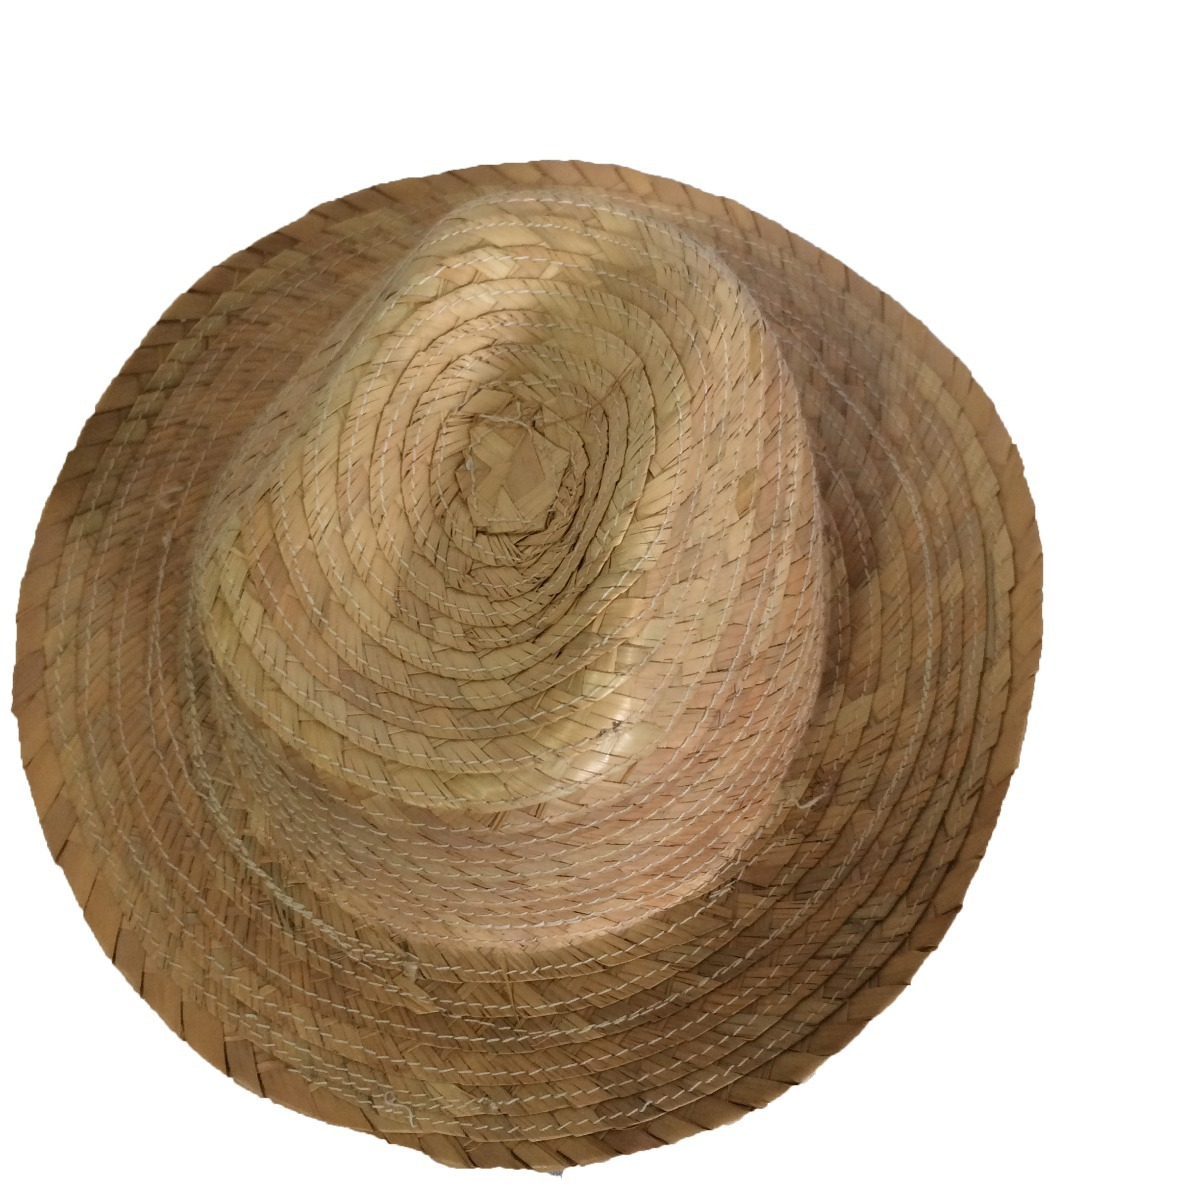 f113d7a92f379 Pack De 4 Sombreros Gorro De Palma Para Niños Vaquero -   99.00 en ...